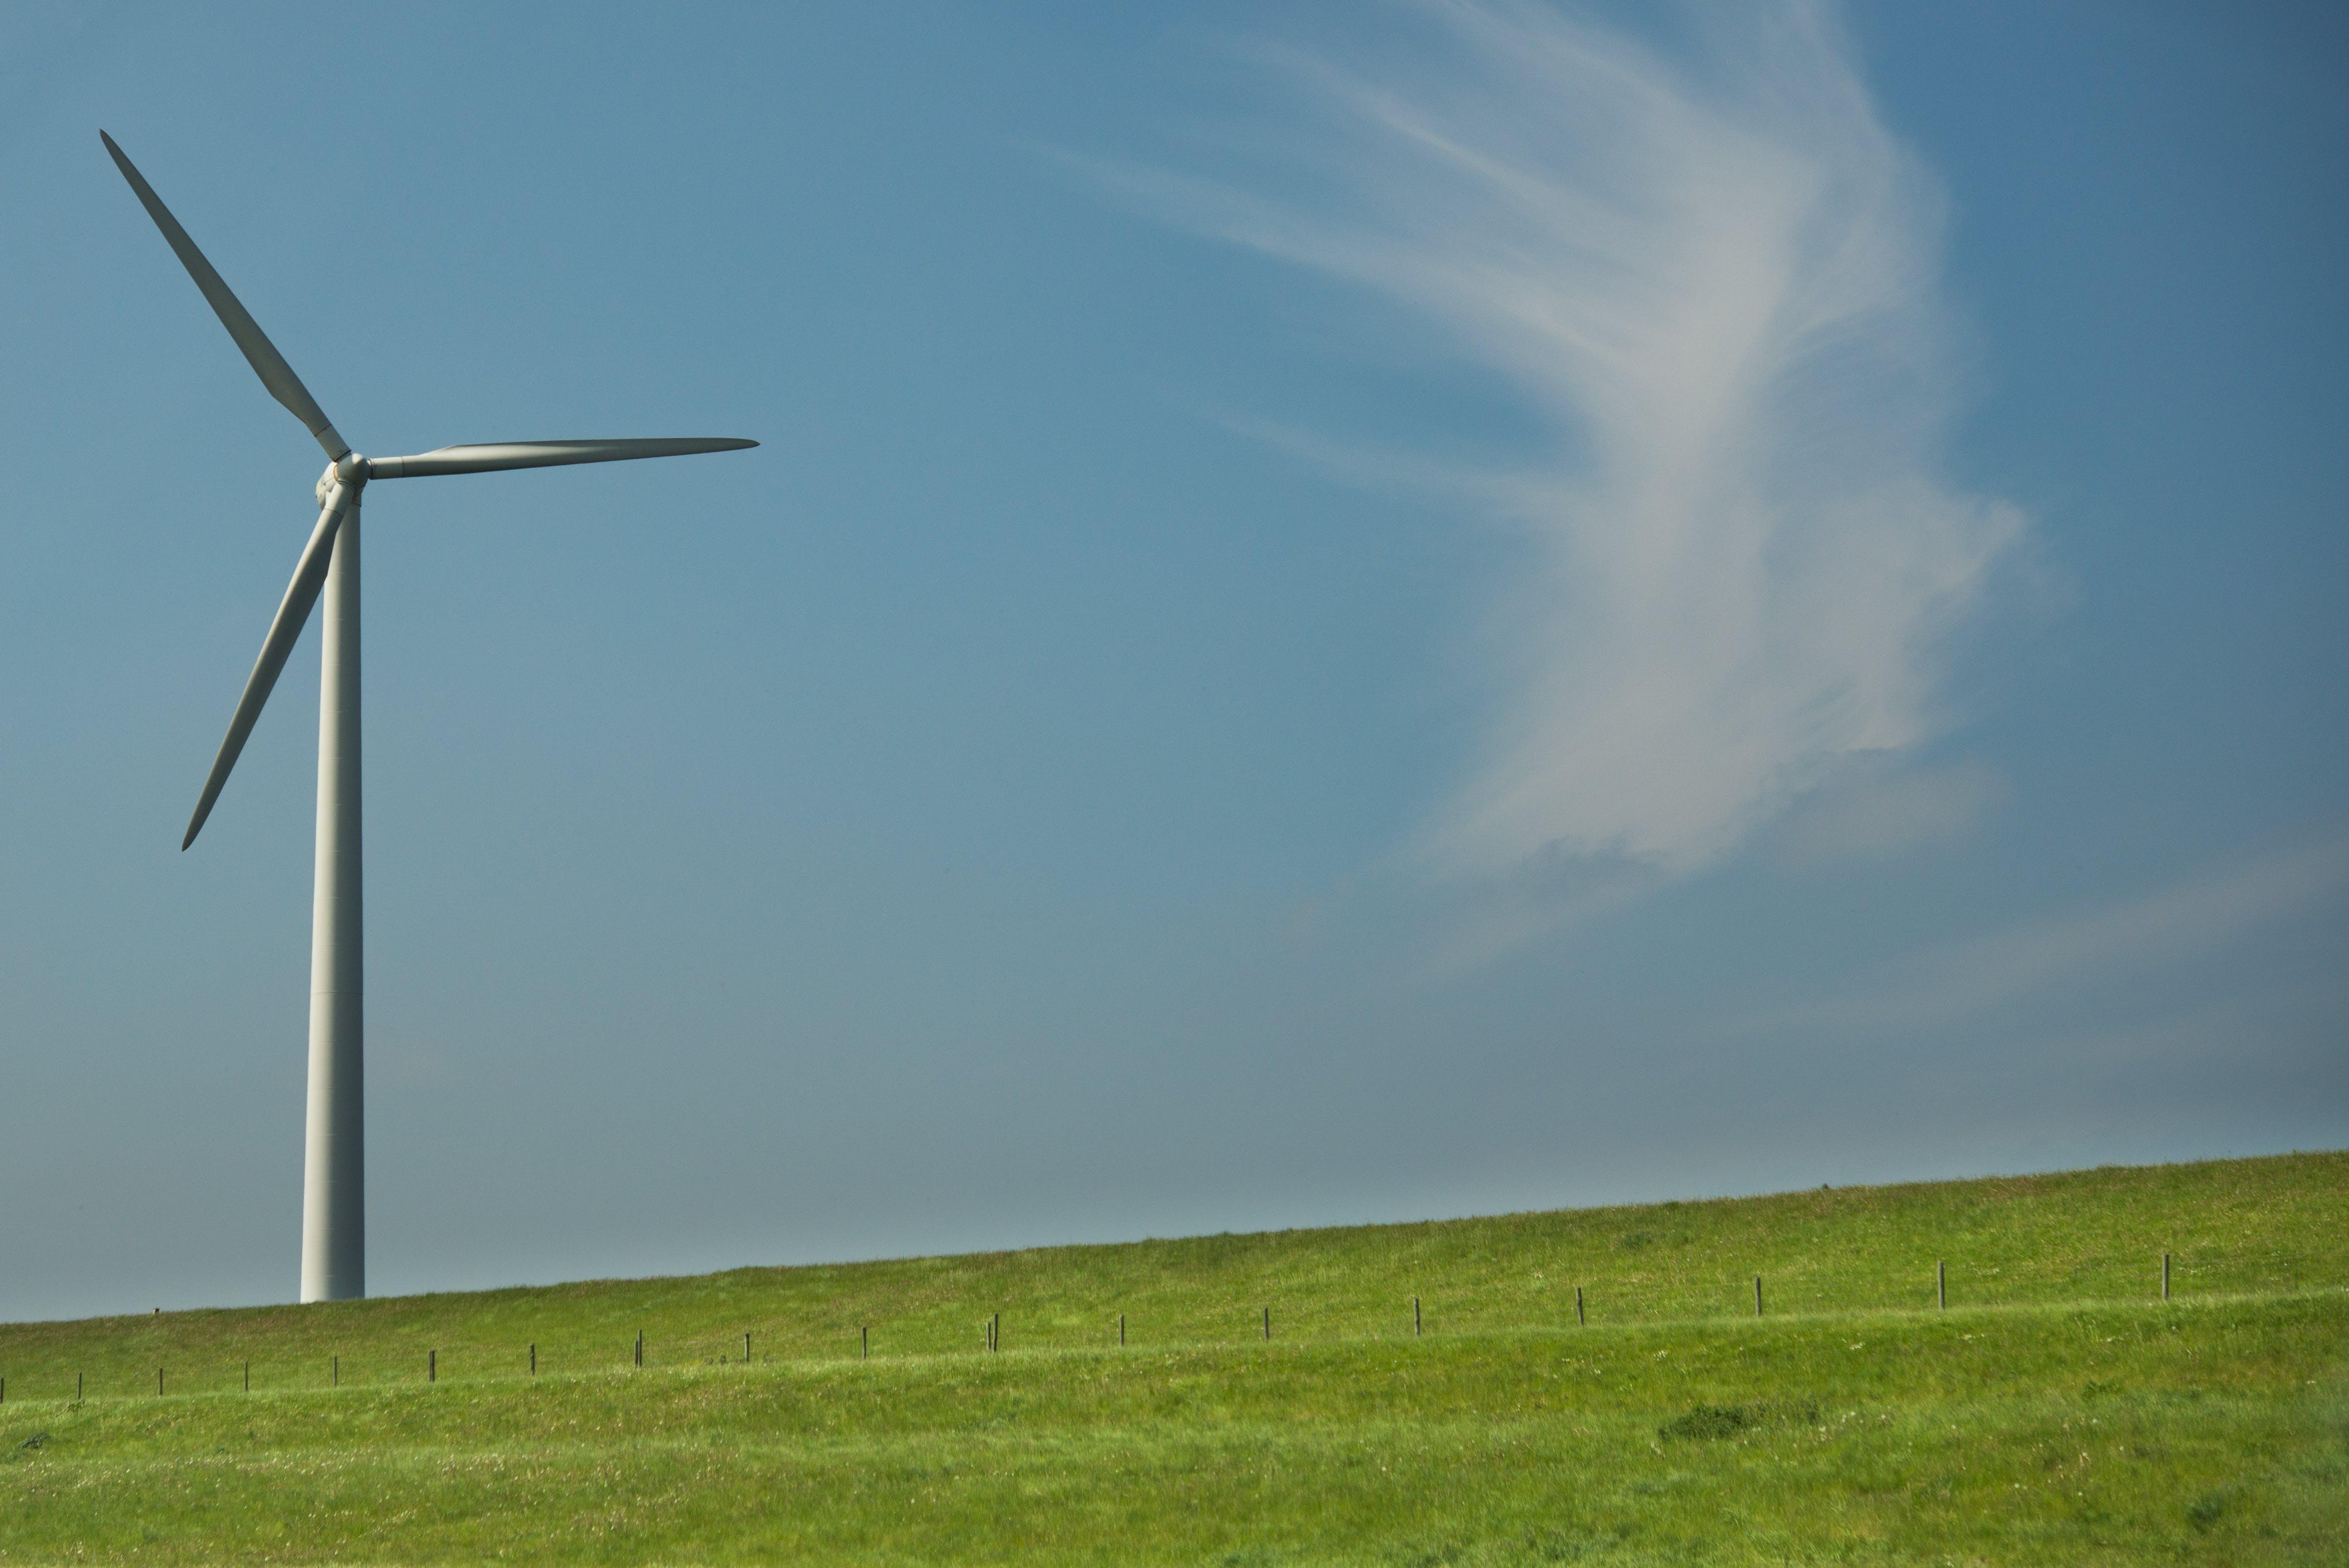 aerogenerador, alternativa, ambiental